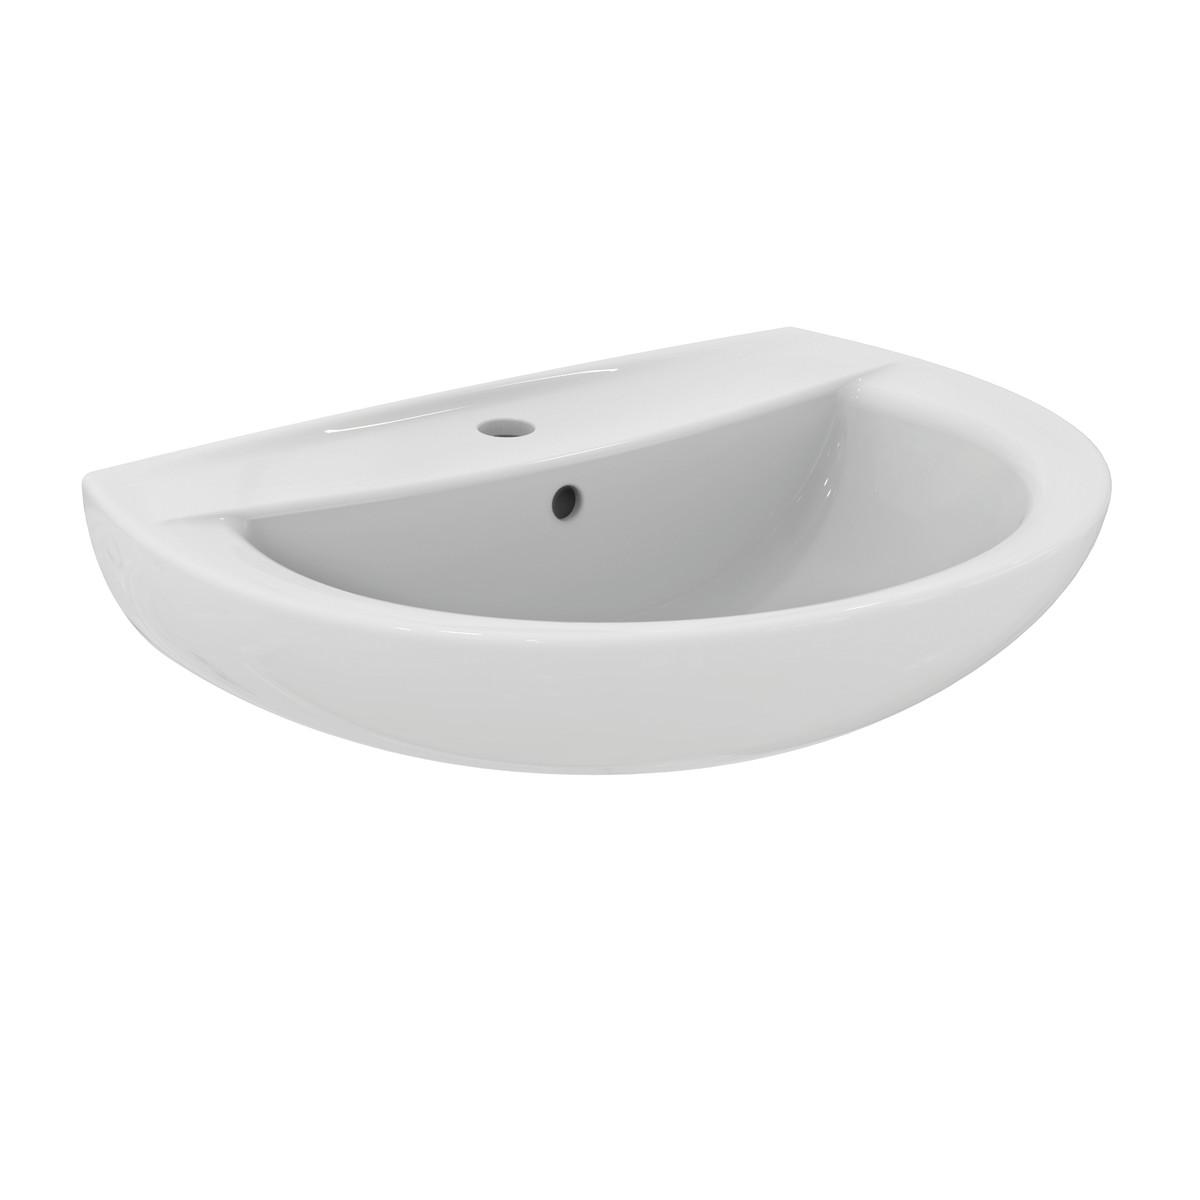 Rubinetti lavabo bagno leroy merlin leroy merlin bagno for Lavabo le roy merlin